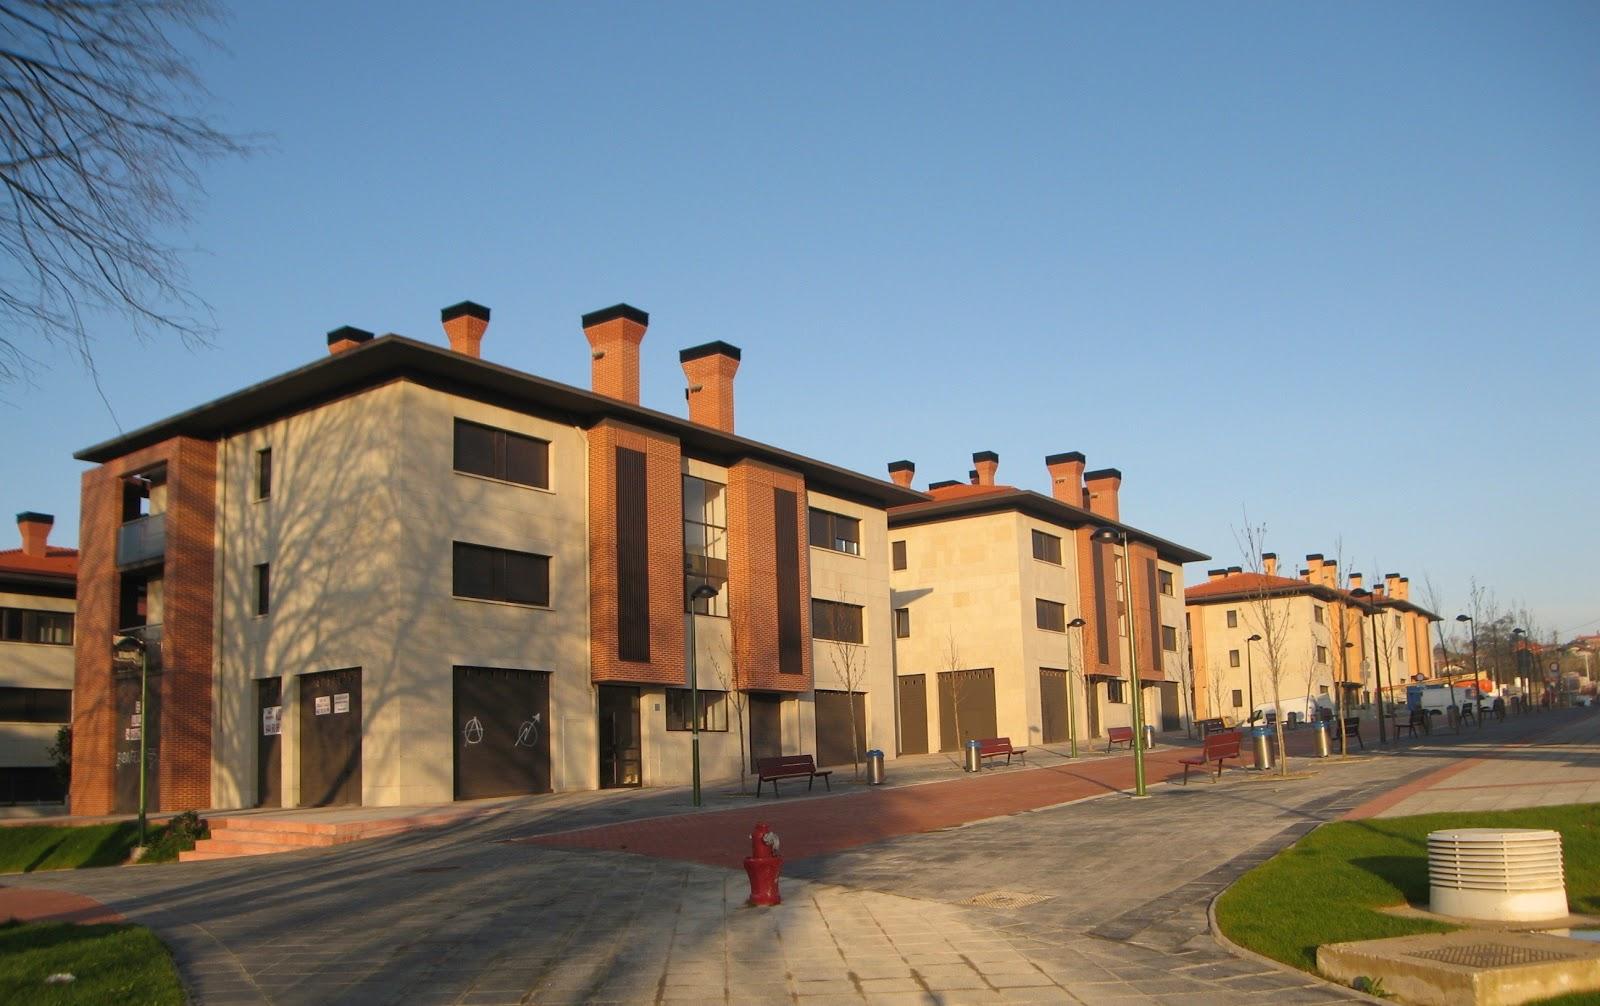 Arquiplan 2 0 64 viviendas libres ormaza en getxo - Viviendas en getxo ...